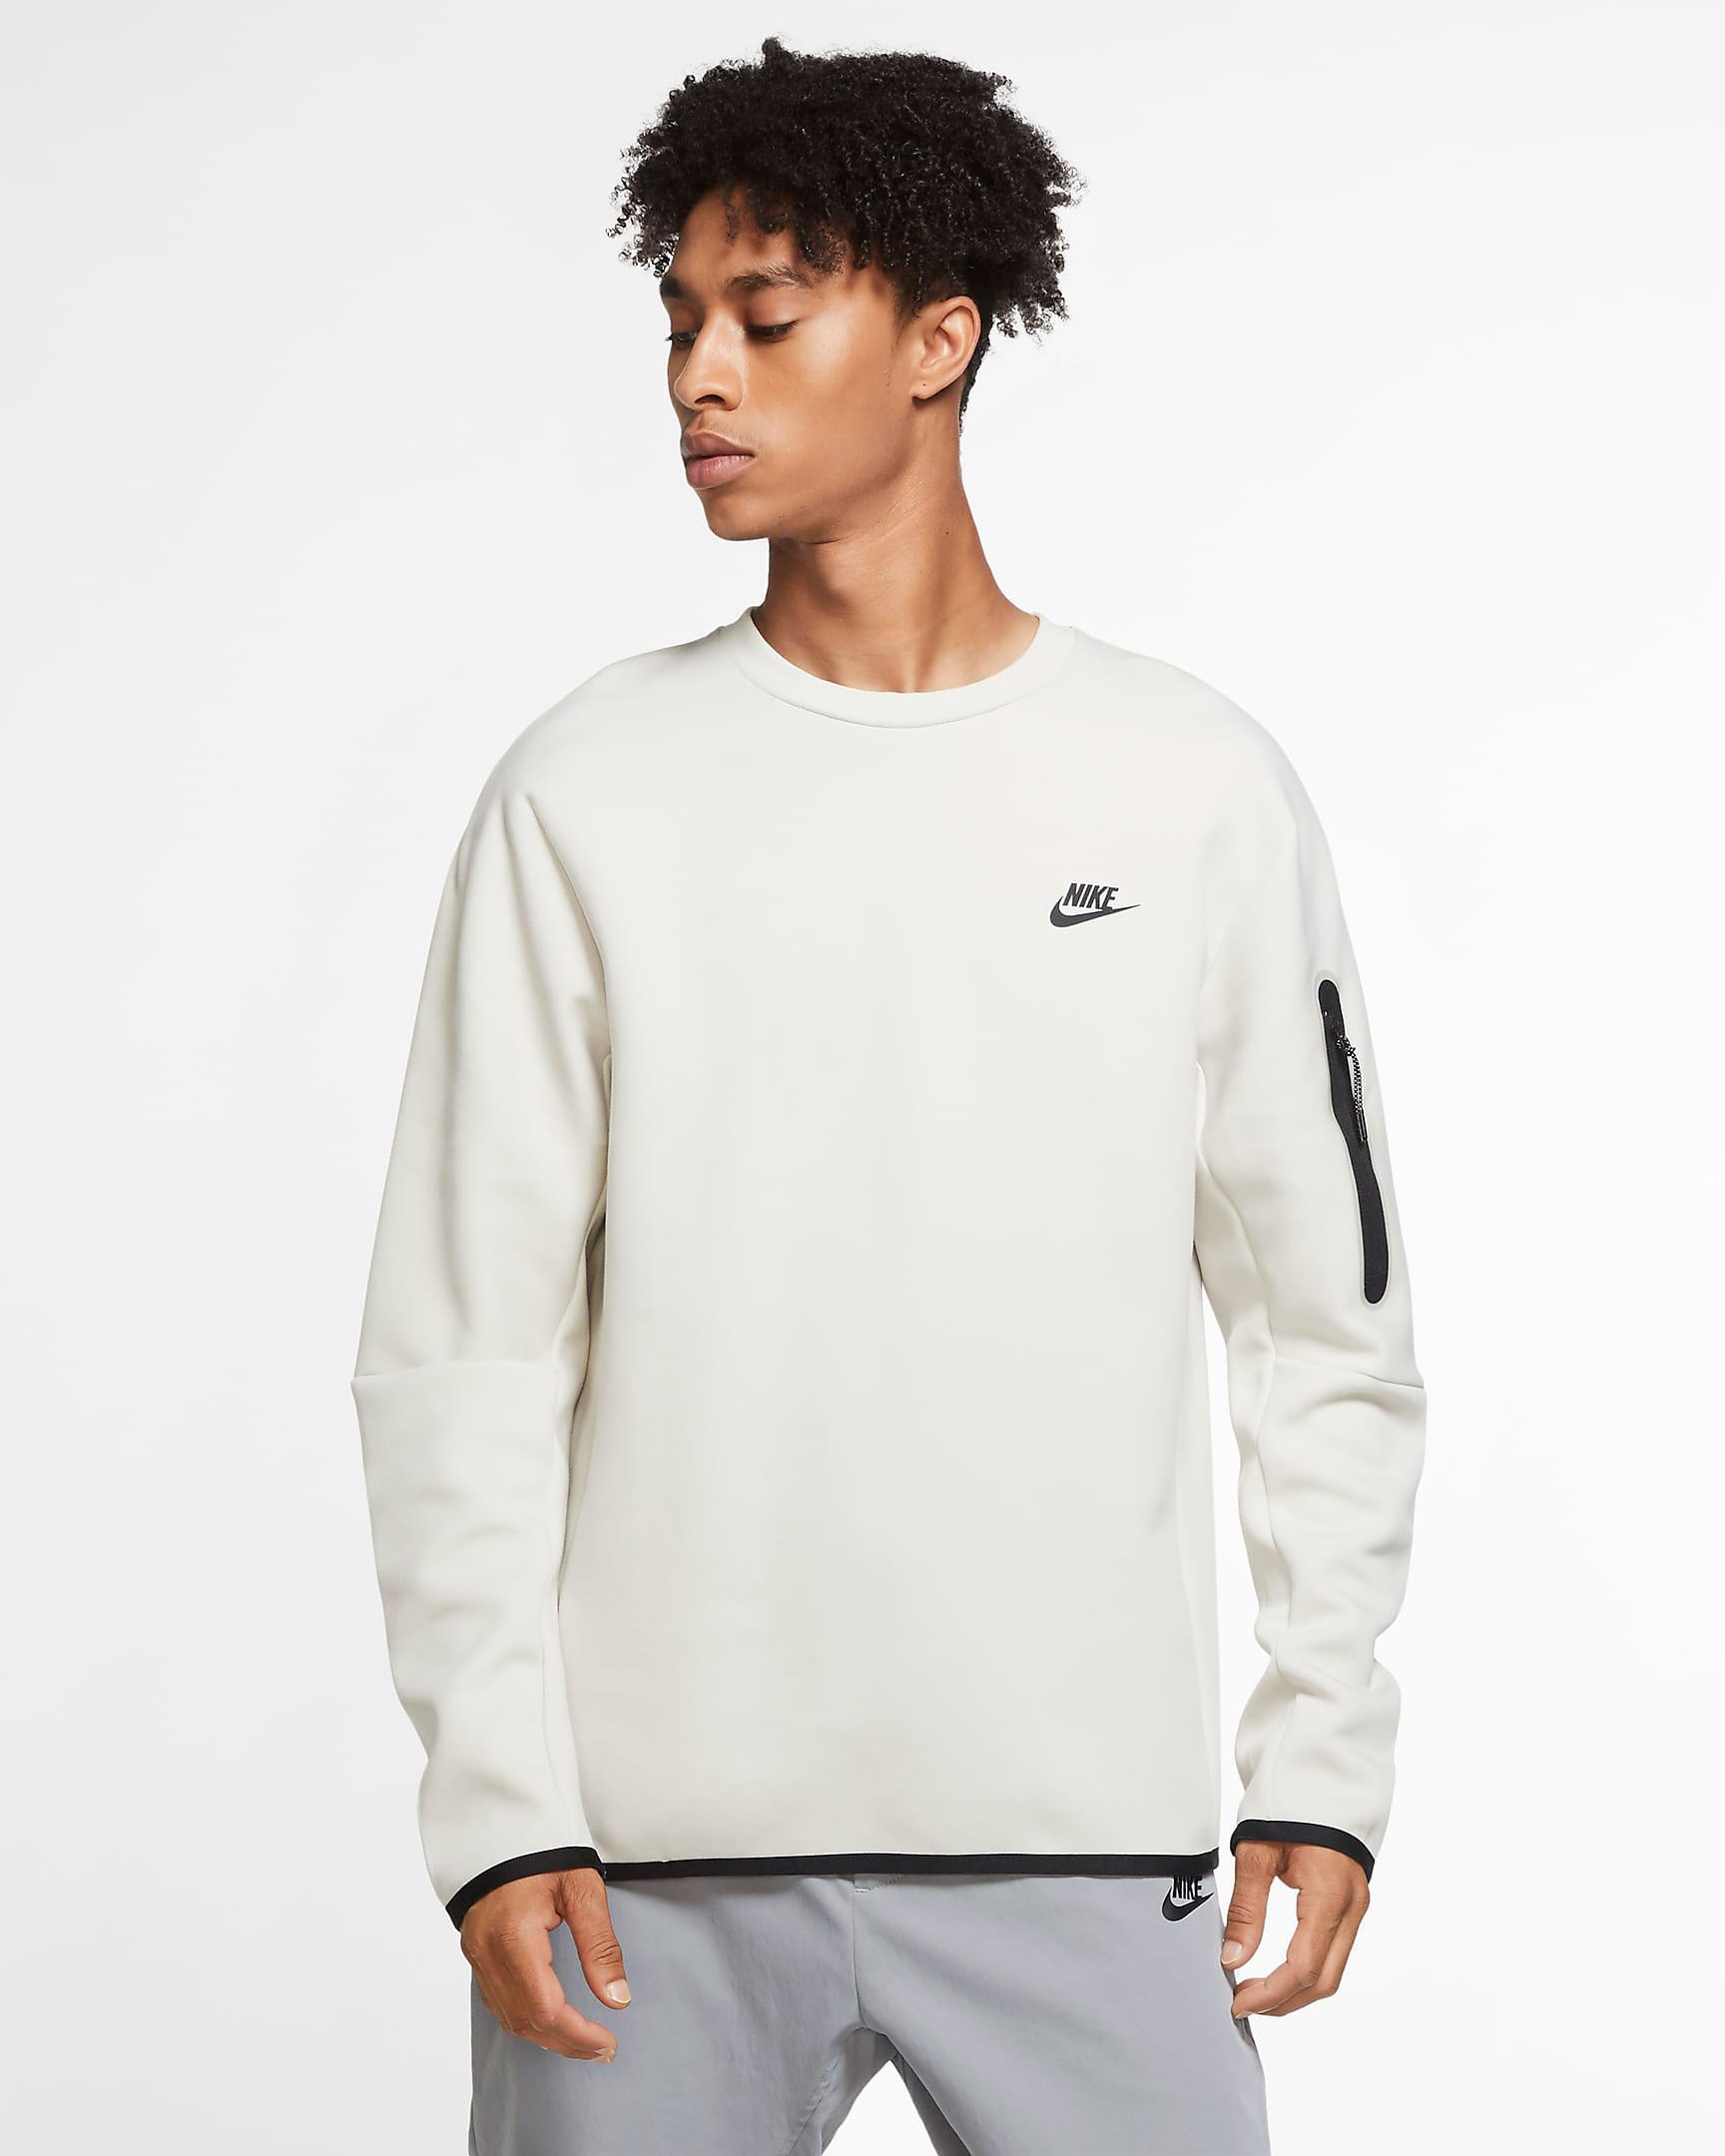 off-white-air-jordan-5-sail-nike-sweatshirt-match